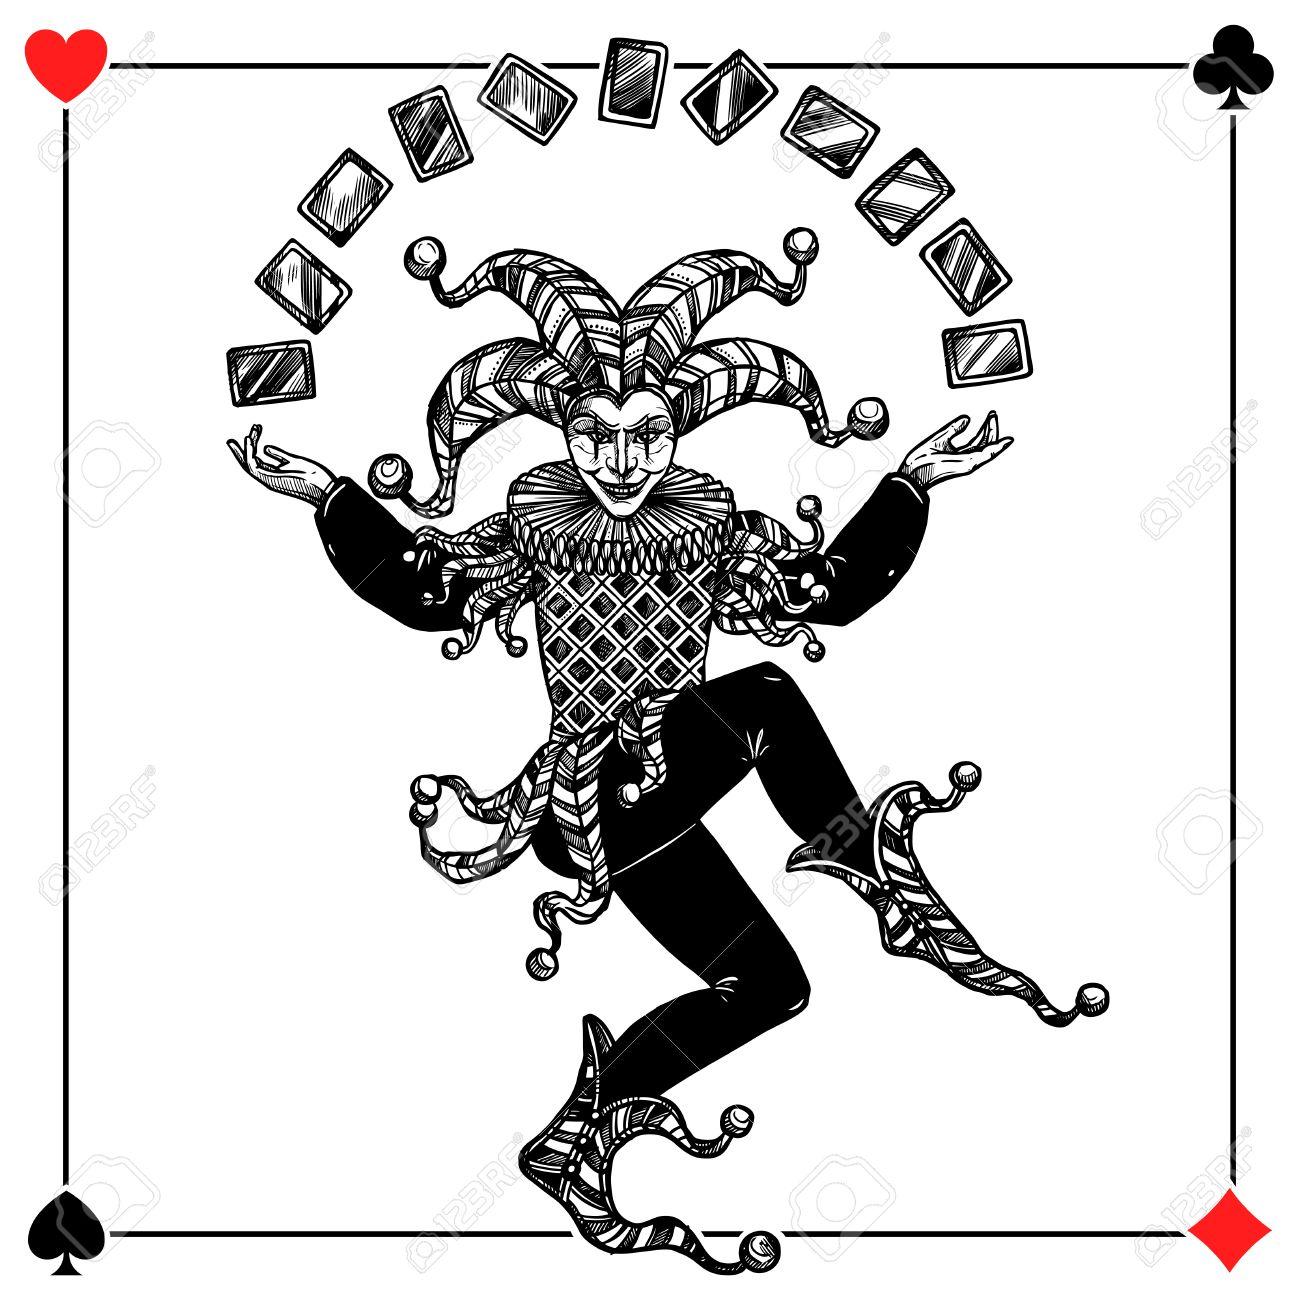 Joker card background with spades hearts diamonds and clubs flat joker card background with spades hearts diamonds and clubs flat vector illustration stock vector 60299187 maxwellsz